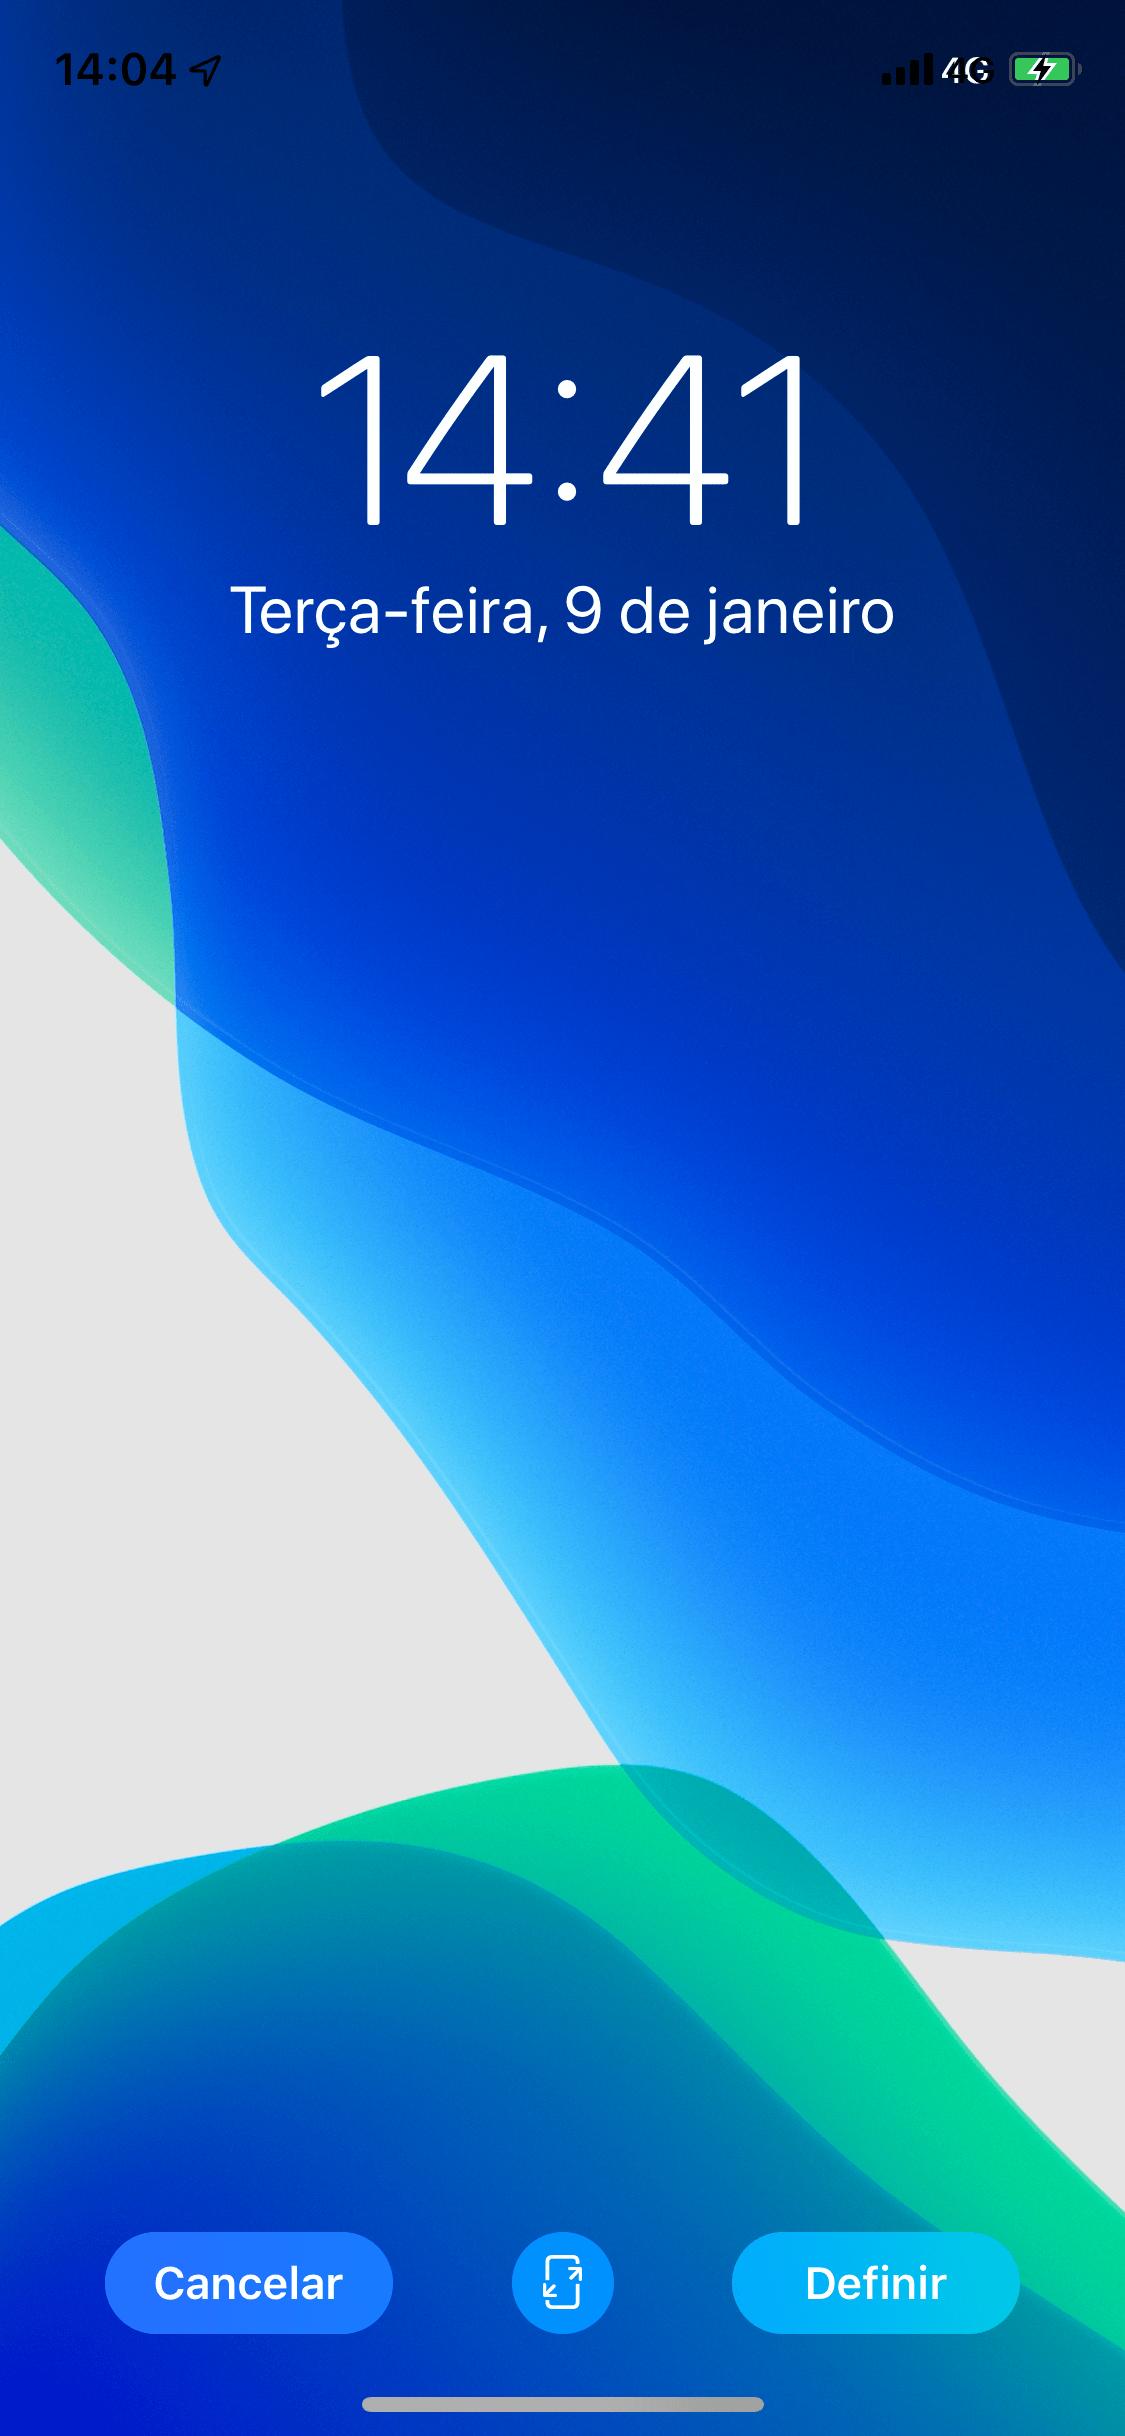 Novidades do iOS 13 - Plano de fundo (estático ou perspectiva)